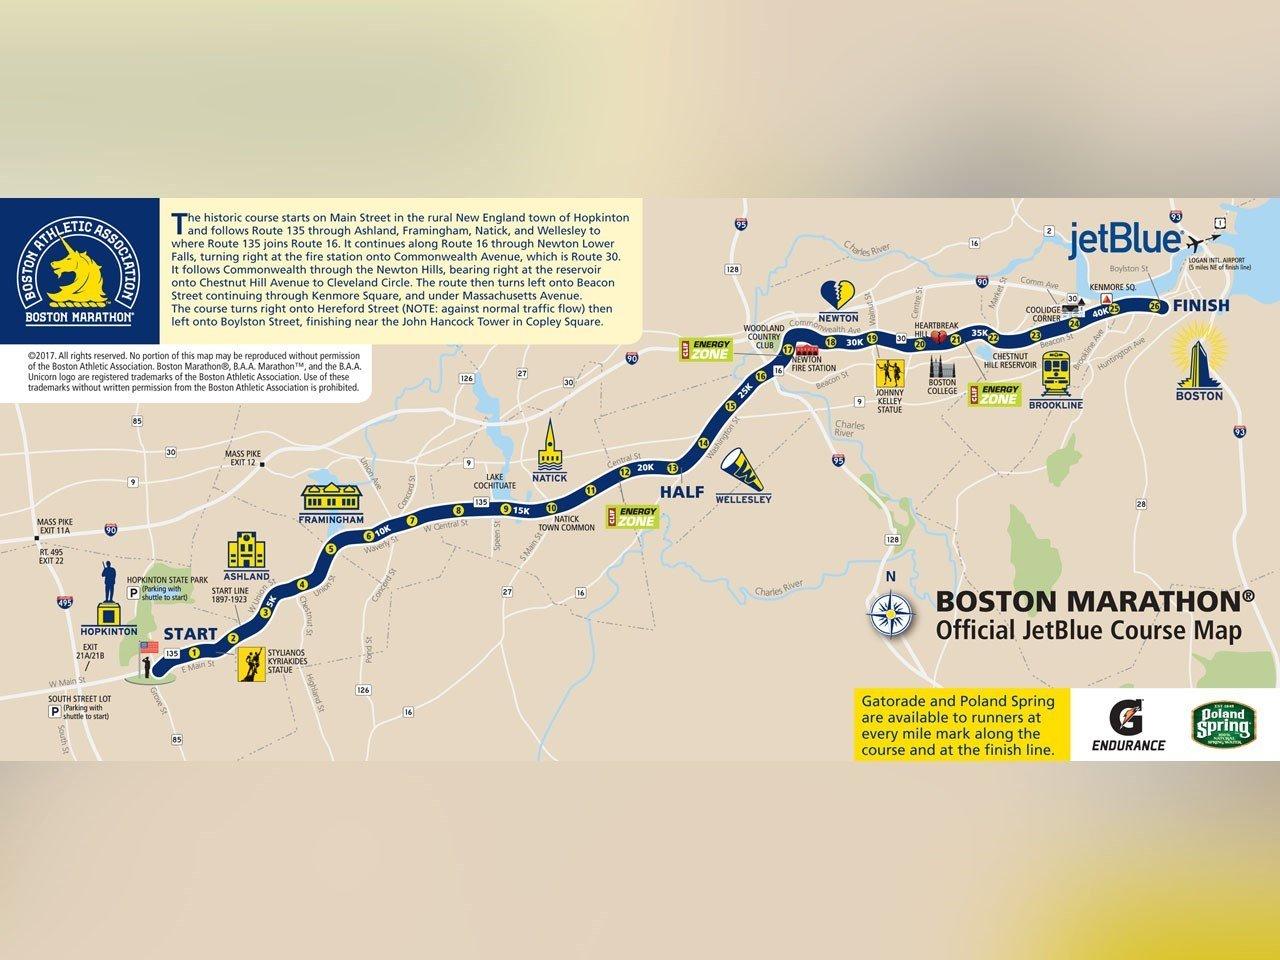 Boston Marathon's 1st Official Woman Contestant Runs After 50 Yrs